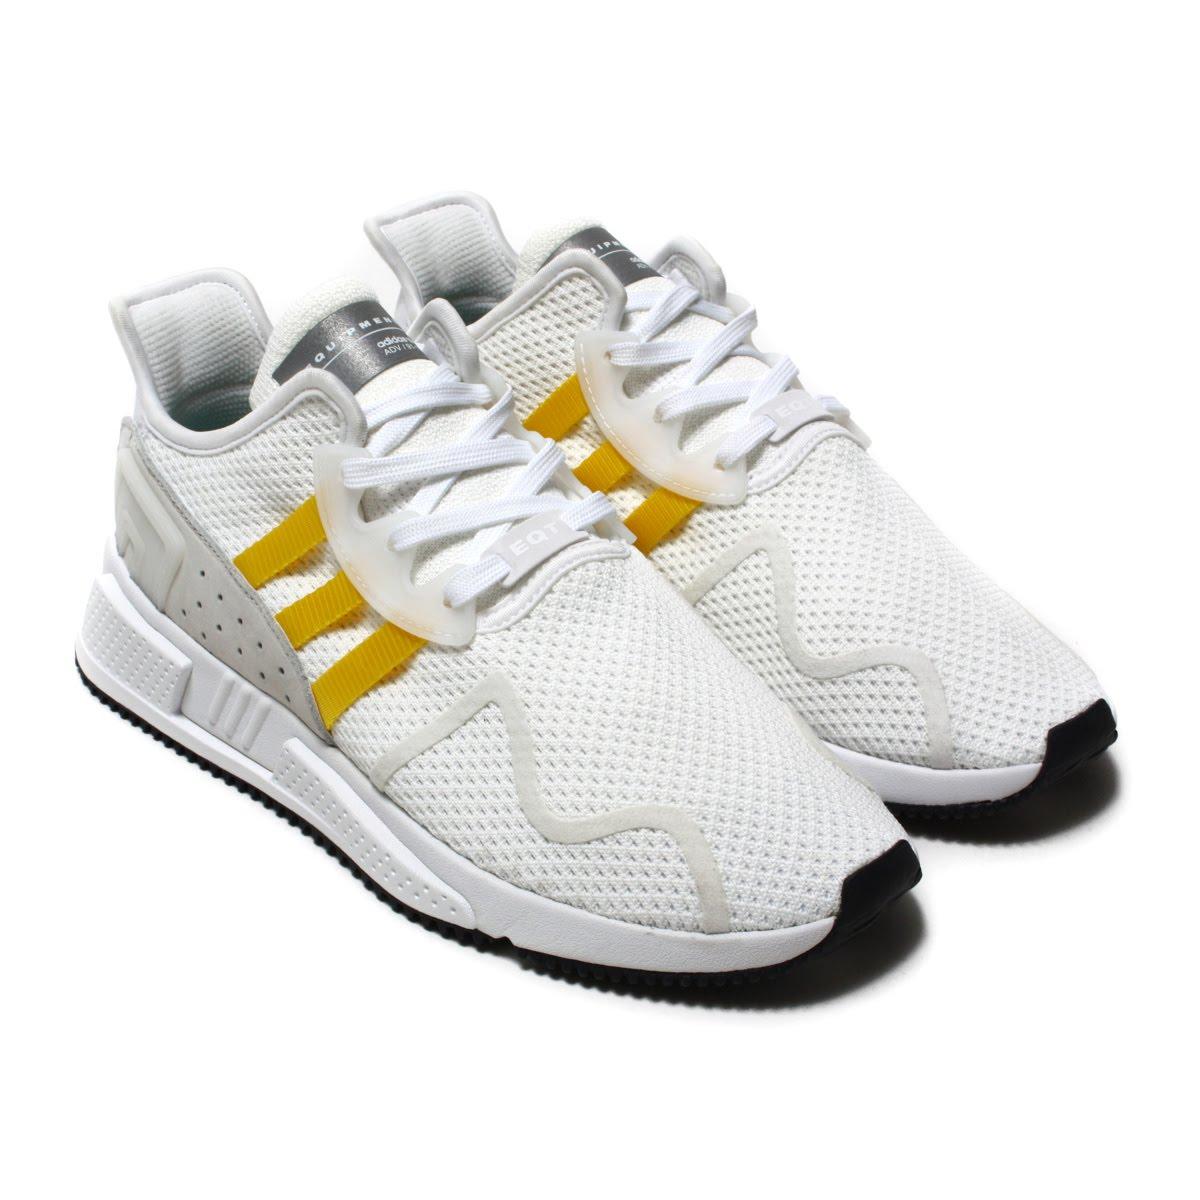 the latest 2c4c4 4ba45 楽天市場adidas Originals EQT CUSHION ADV(アディダス オリジナルス イーキューティー クッション ADV)Running  WhiteEqt YellowSilver Metメンズ ...